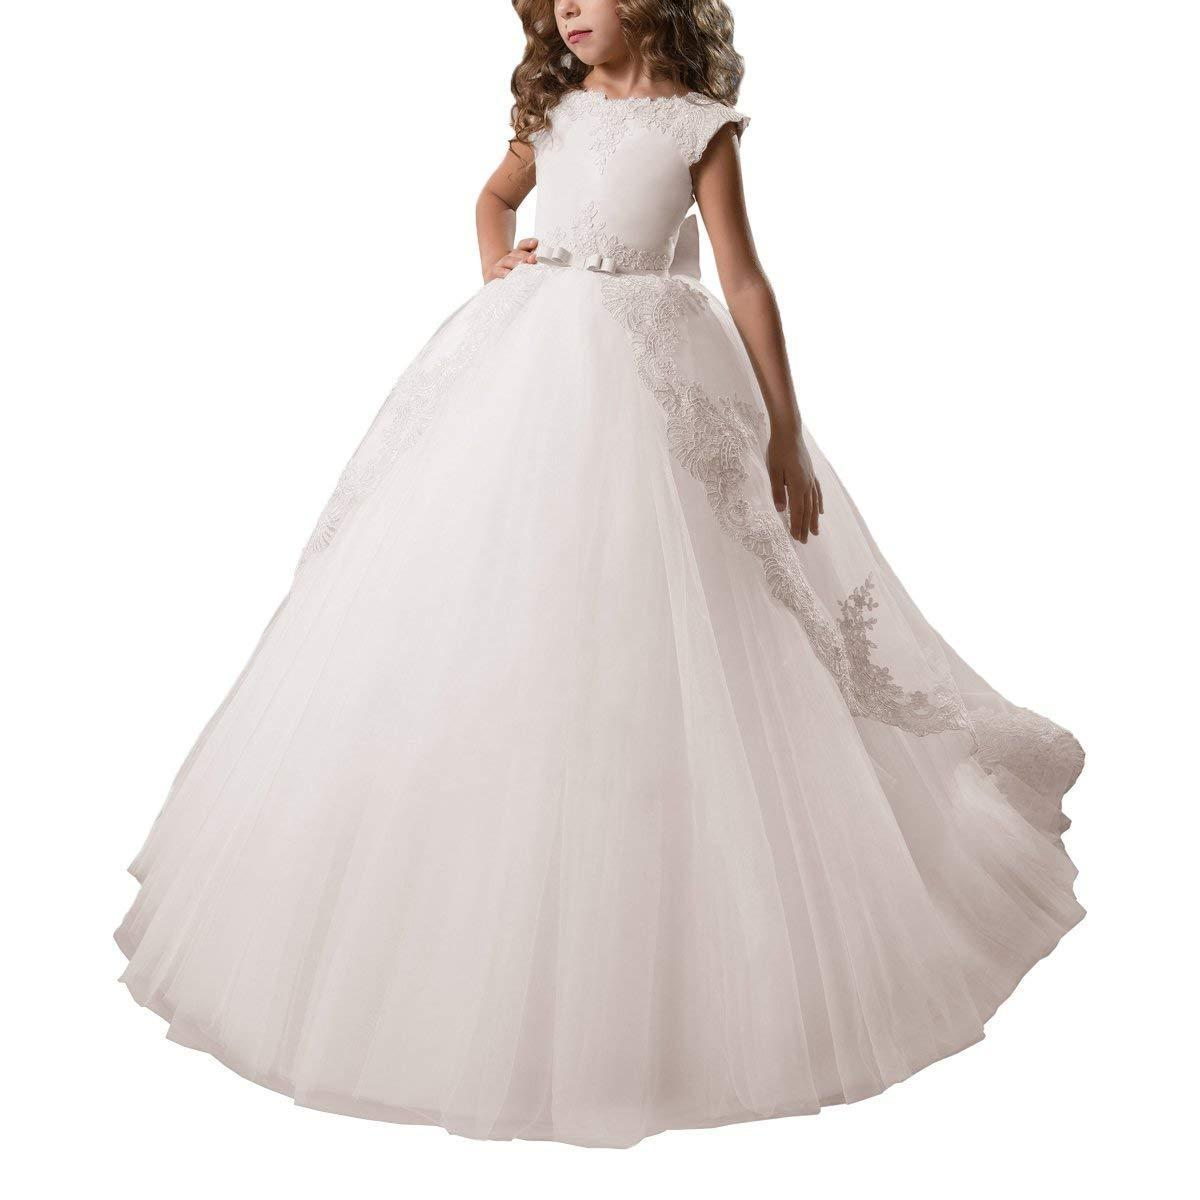 c8b1adab693 White Flower Girl Dresses With Burgundy Sash